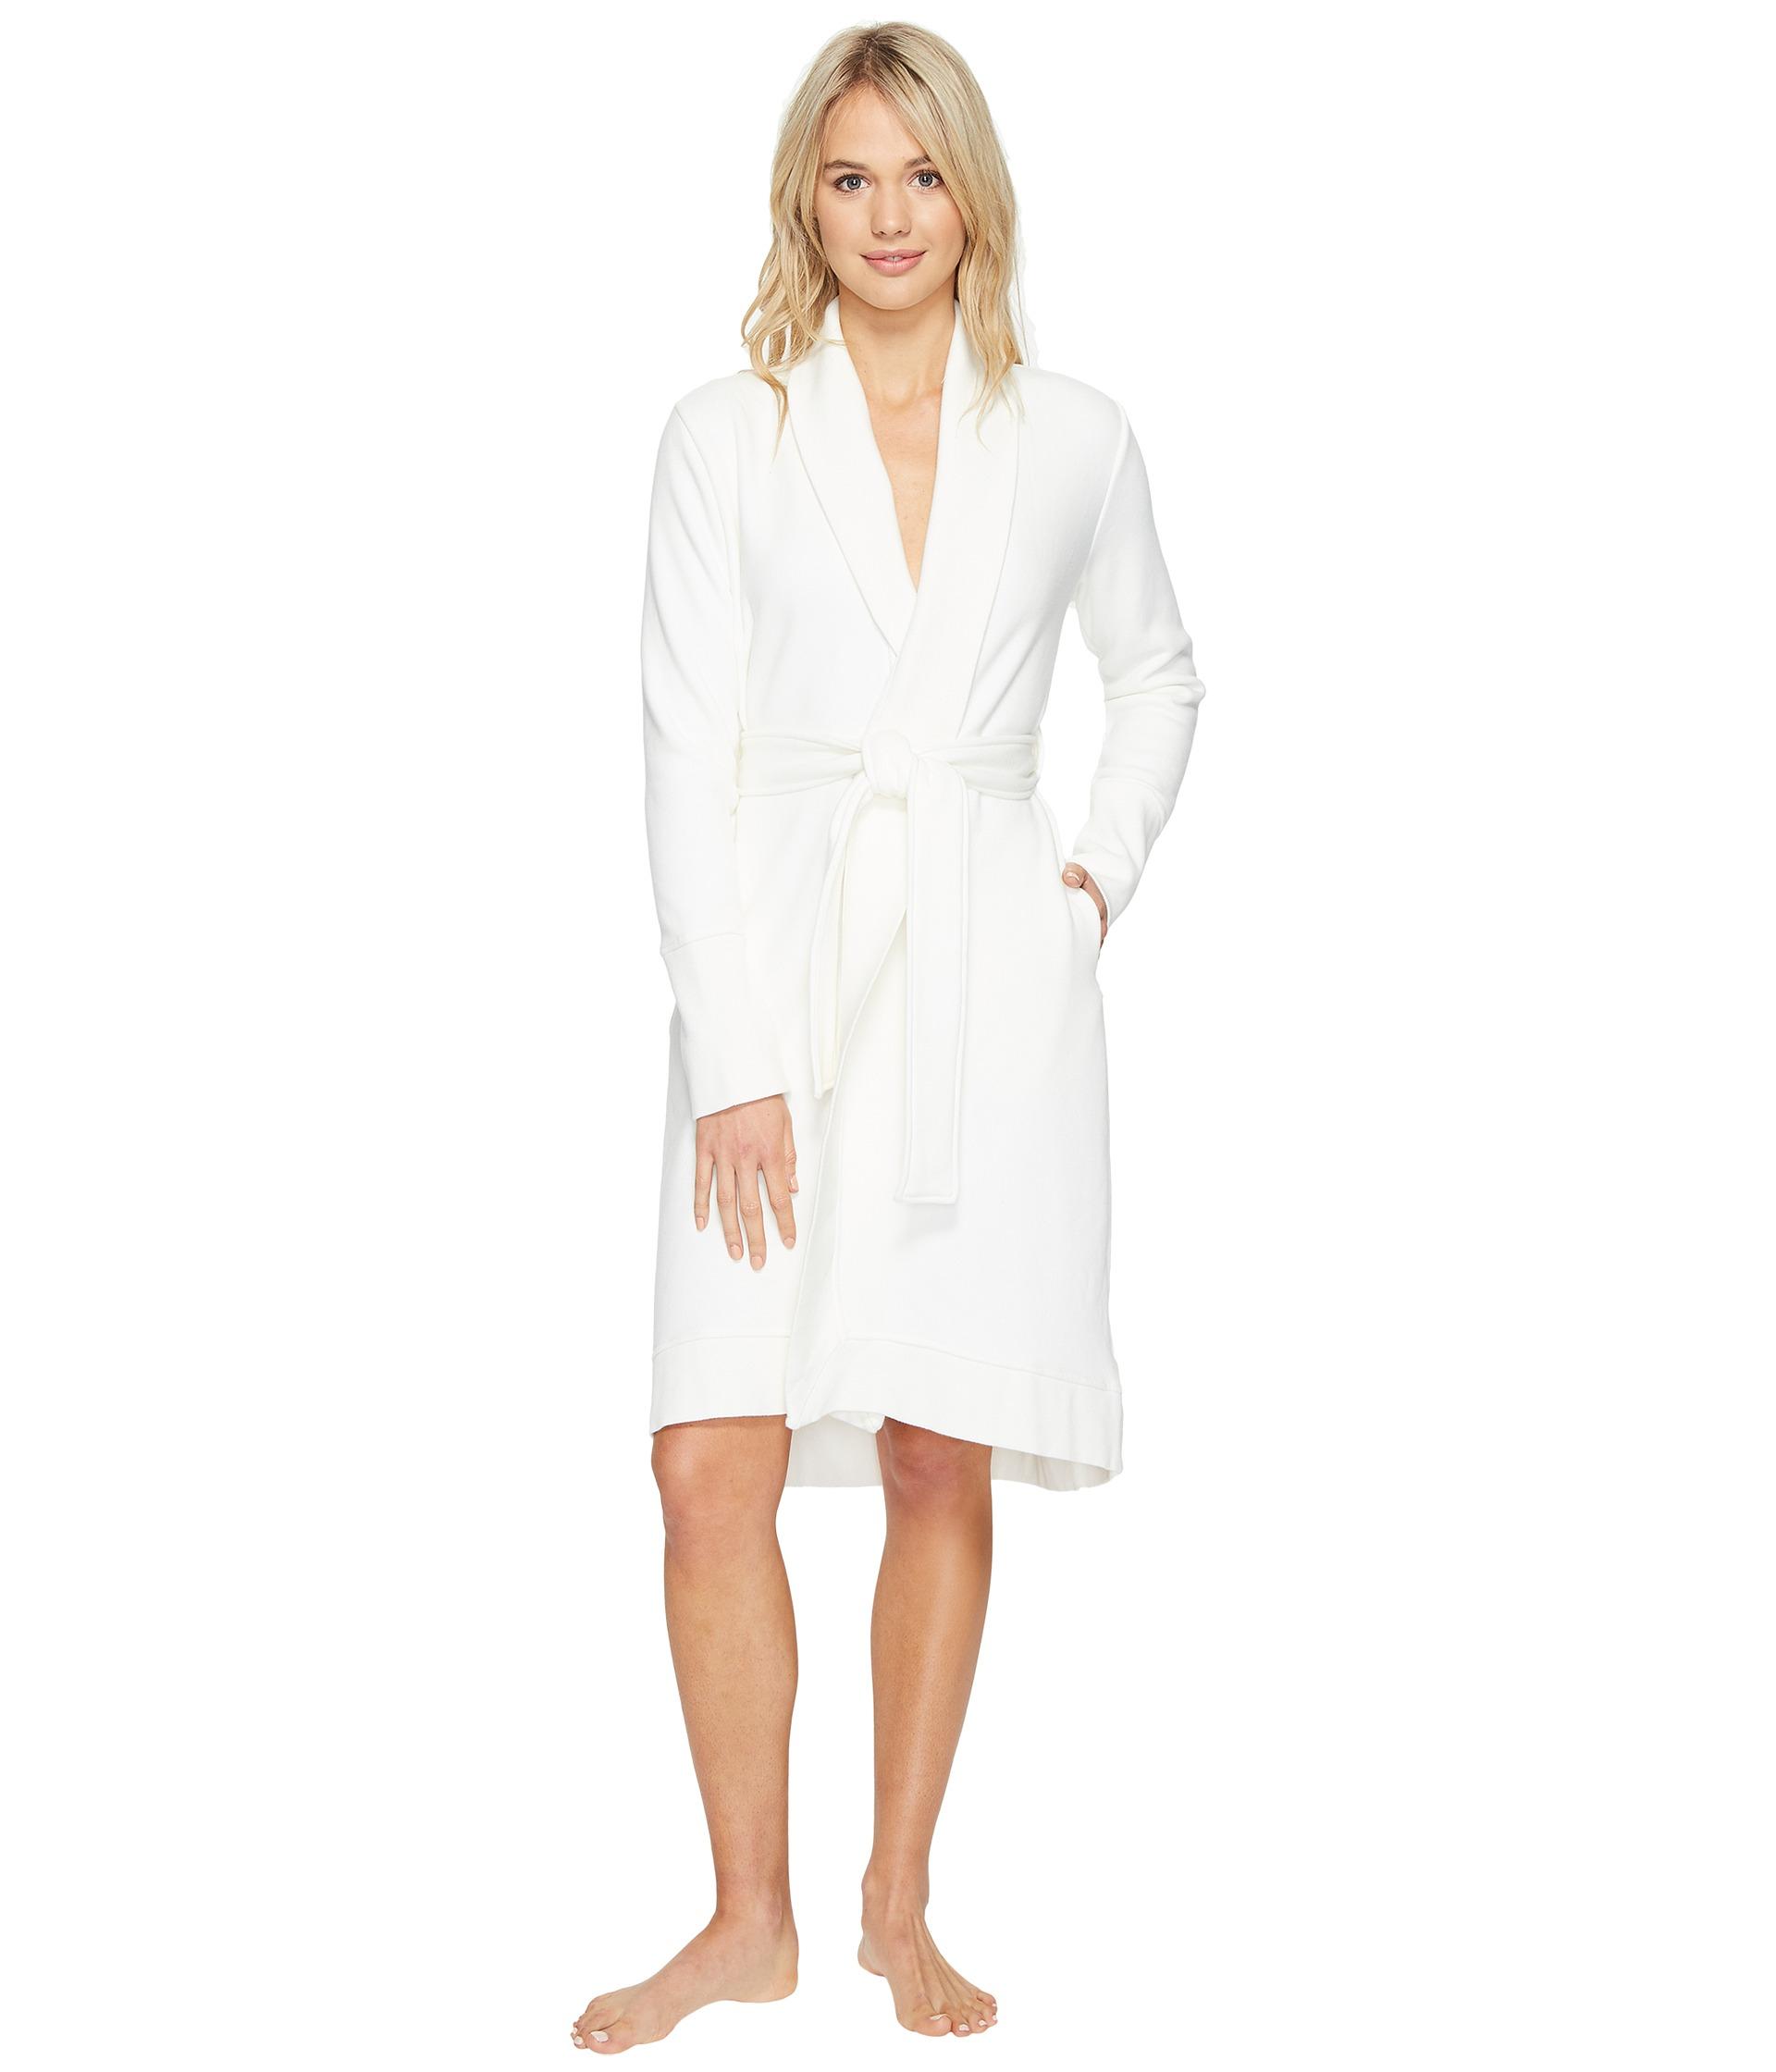 robe blanche h et m robe fashion france. Black Bedroom Furniture Sets. Home Design Ideas